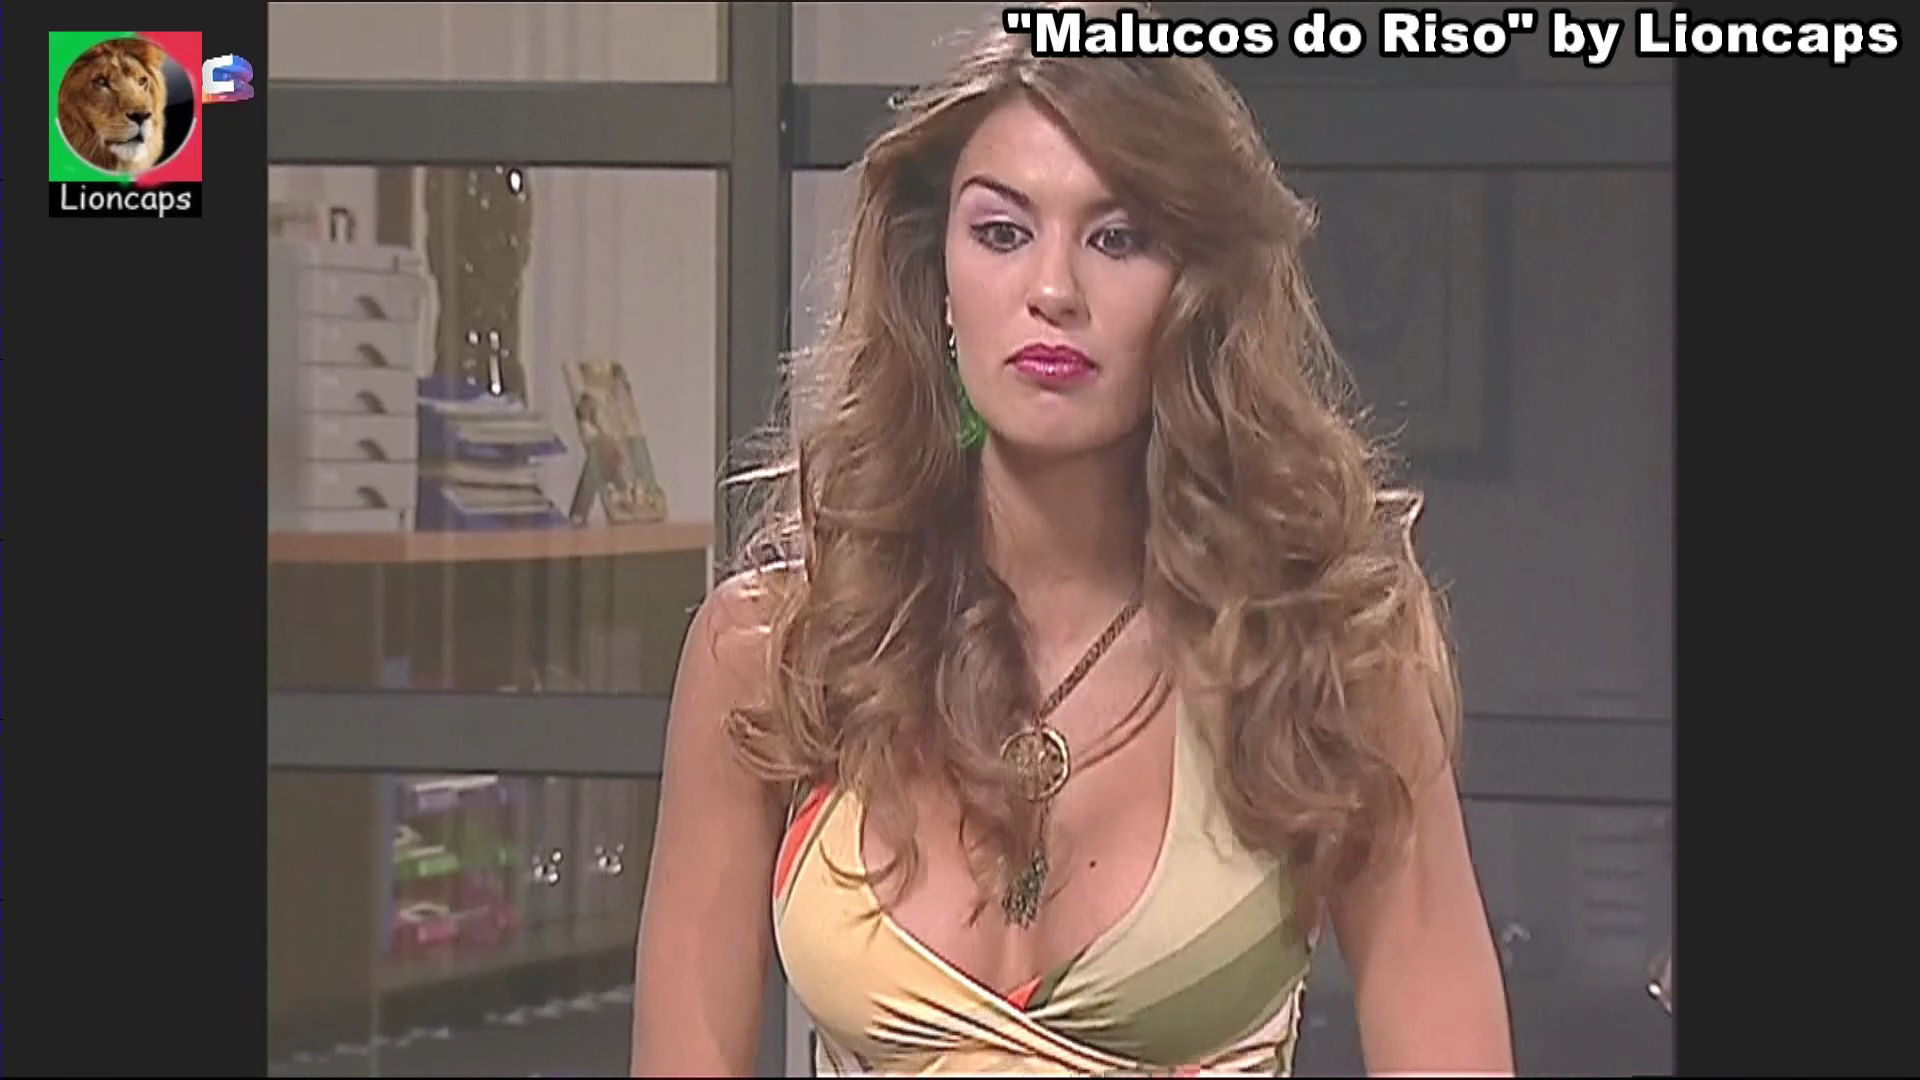 475124674_malucos_riso_alda_gomes_vs190malucos_riso_602_15046_122_172lo.JPG